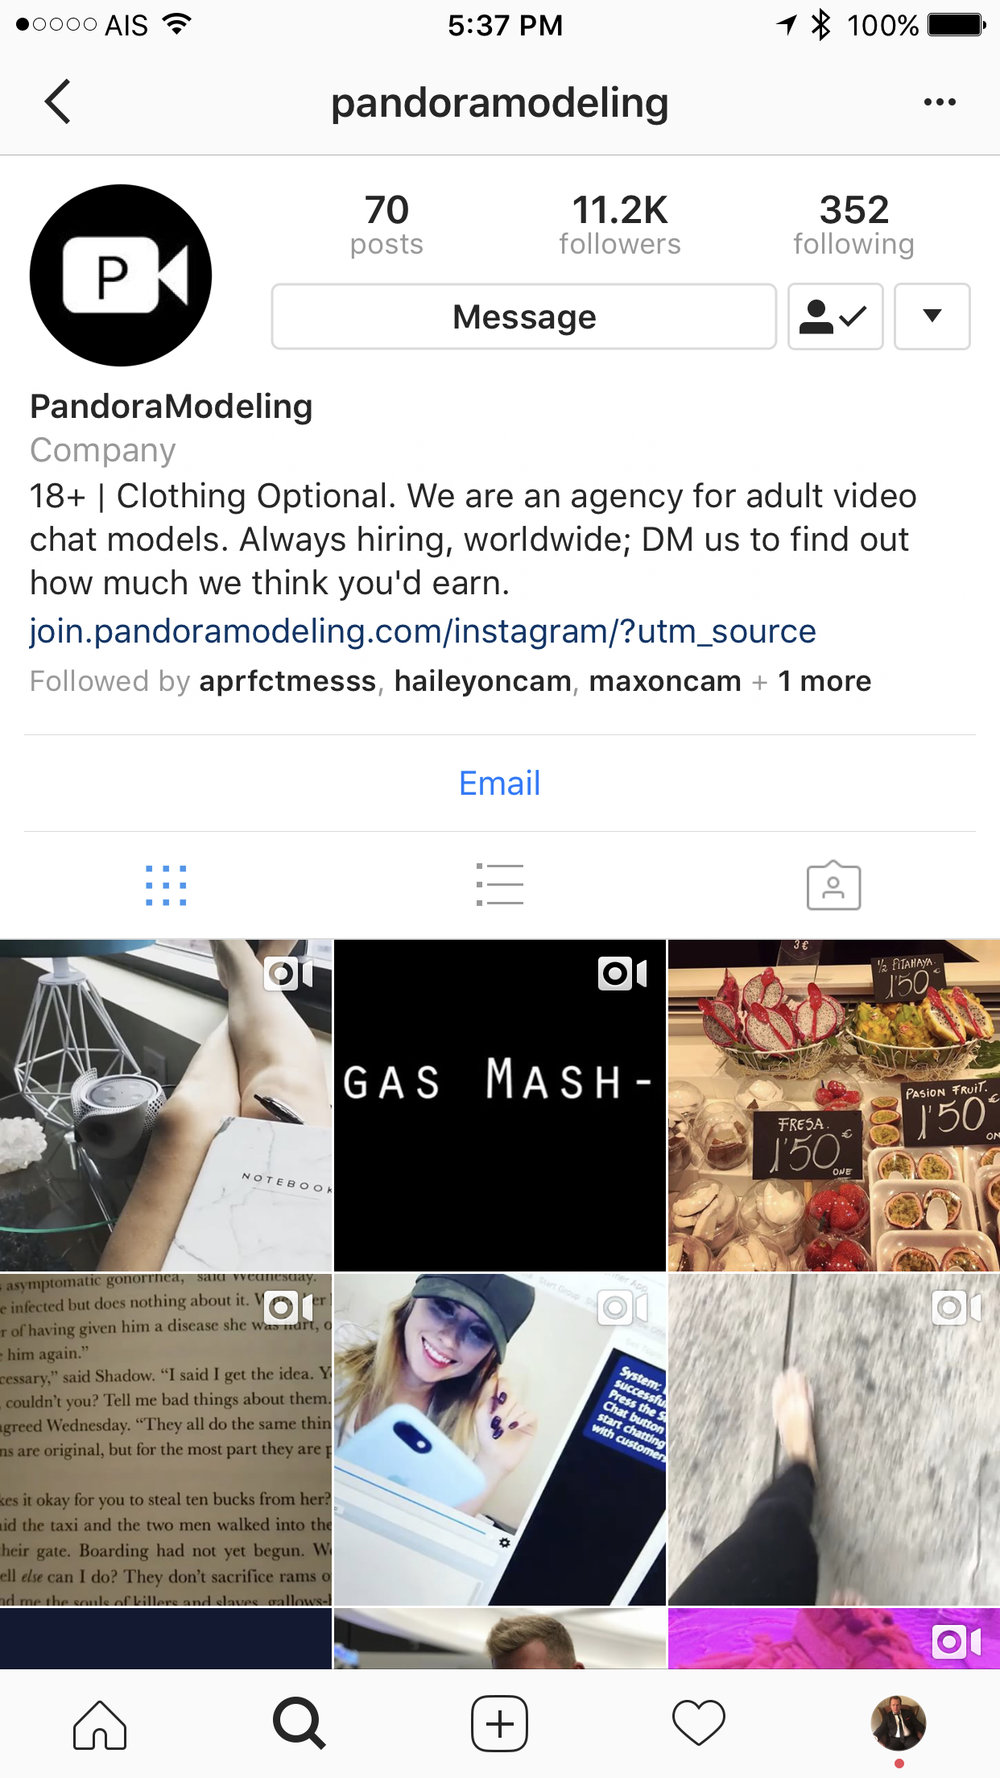 pandoramodeling instagram